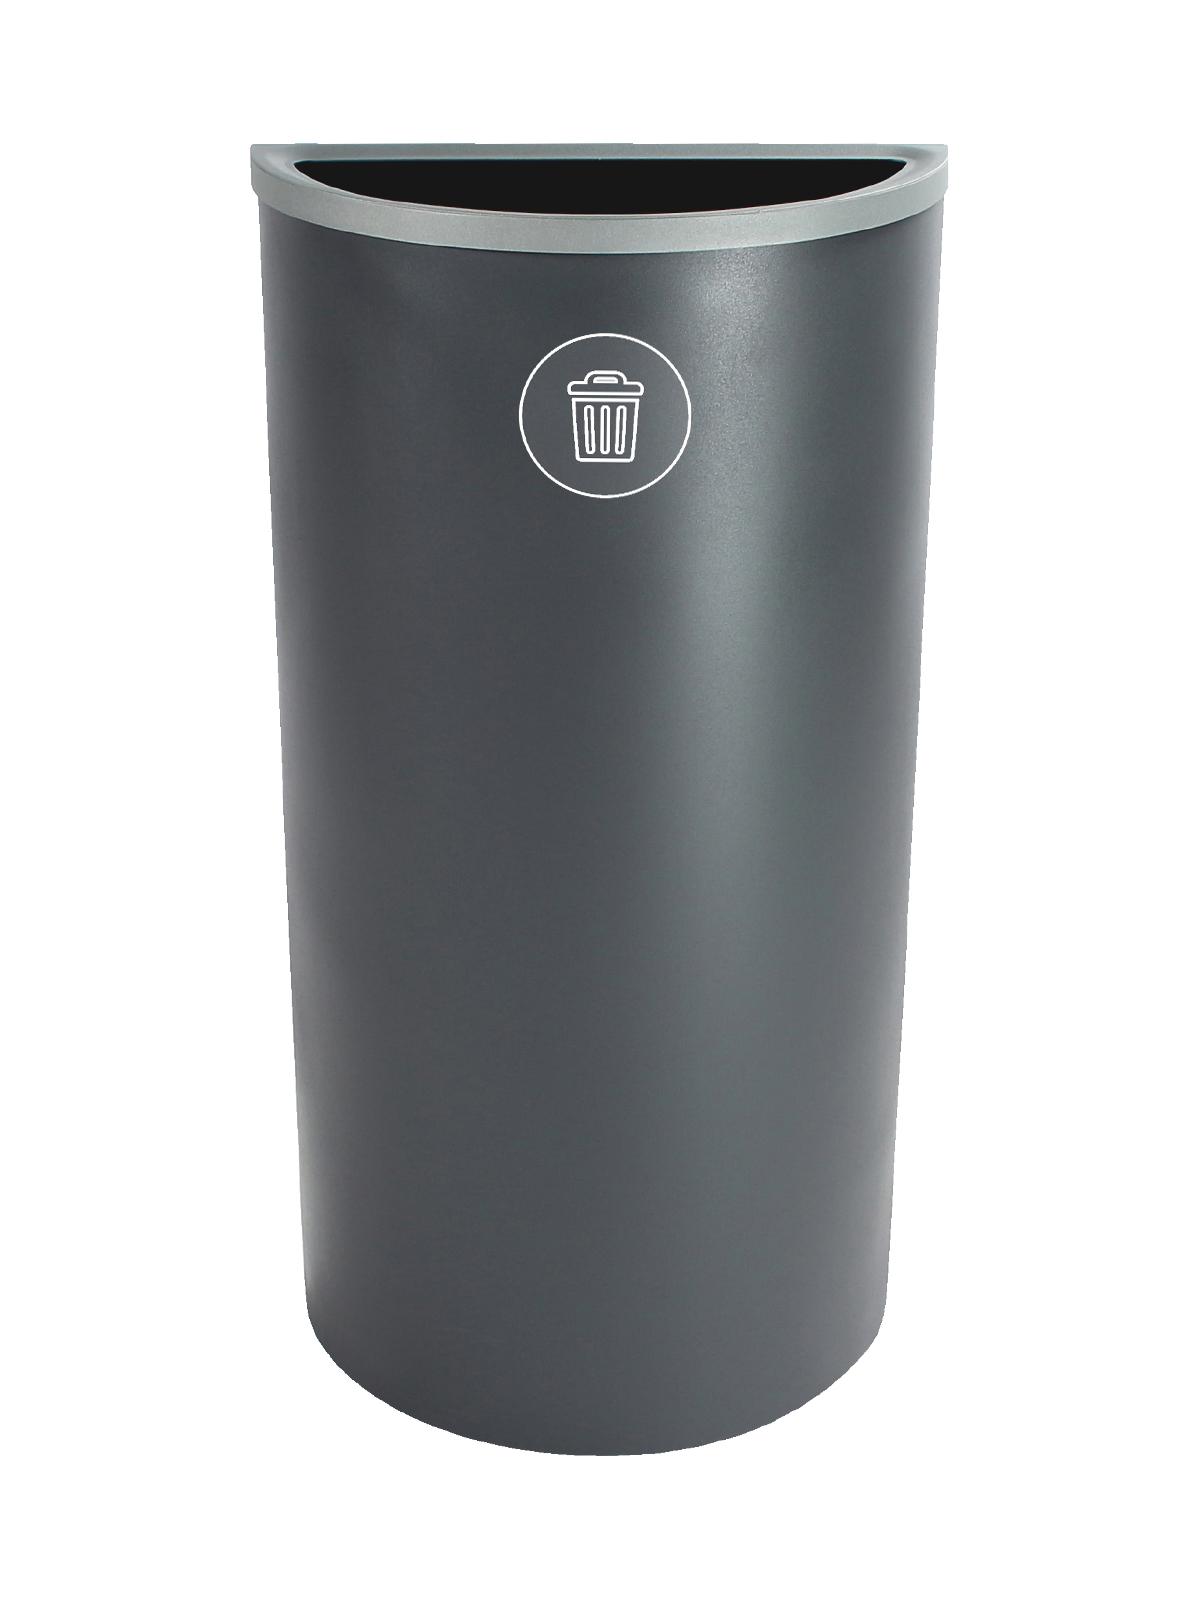 SPECTRUM - Single - Ellipse Slim - Waste - Full - Grey